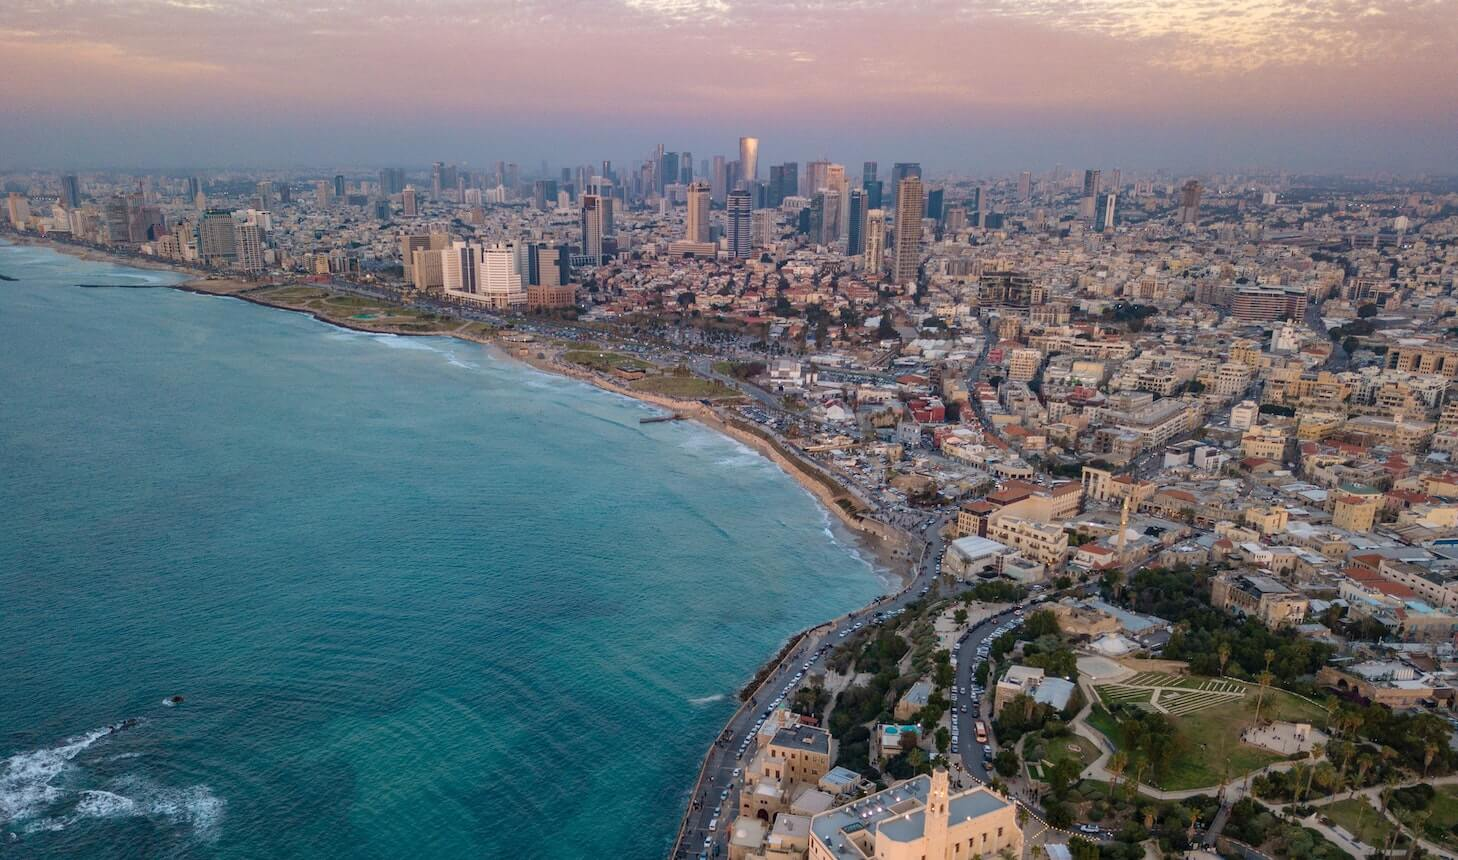 Israel's IT staff shortage